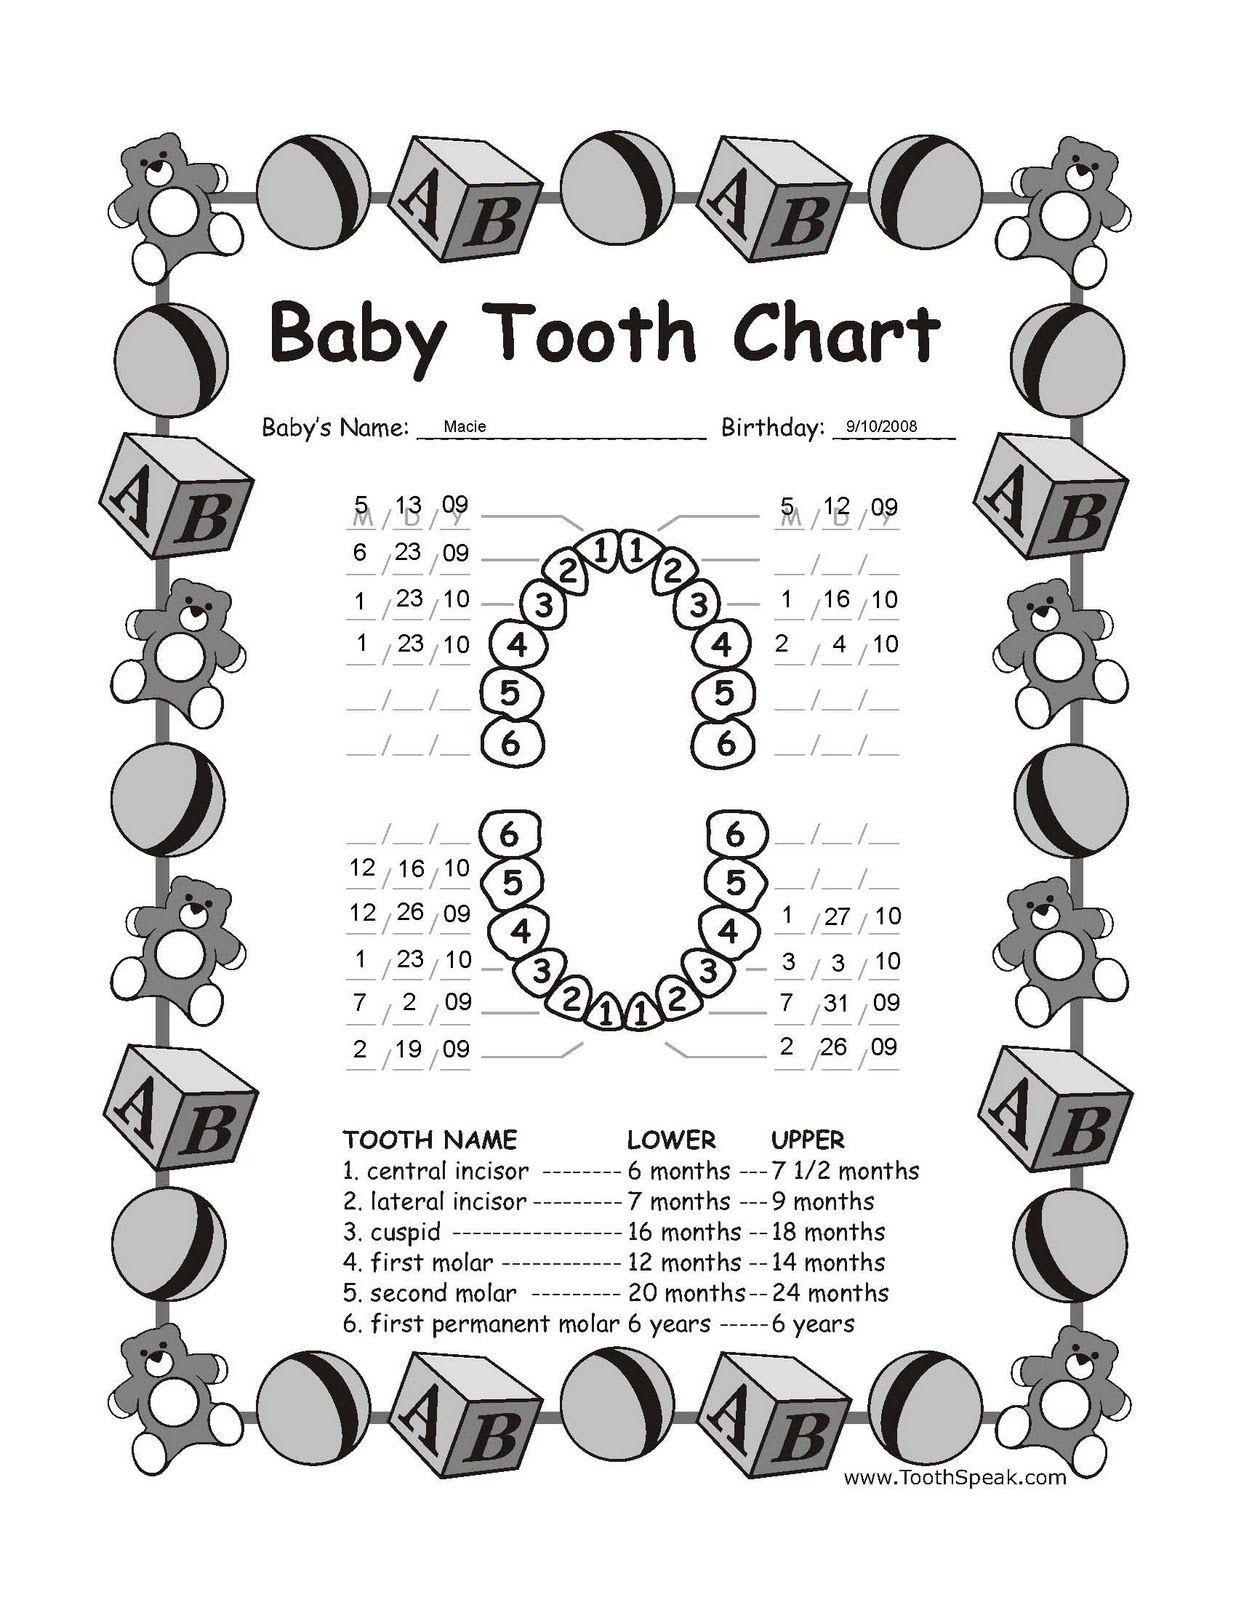 Herman Nation Tooth     Fogtndr    Teeth